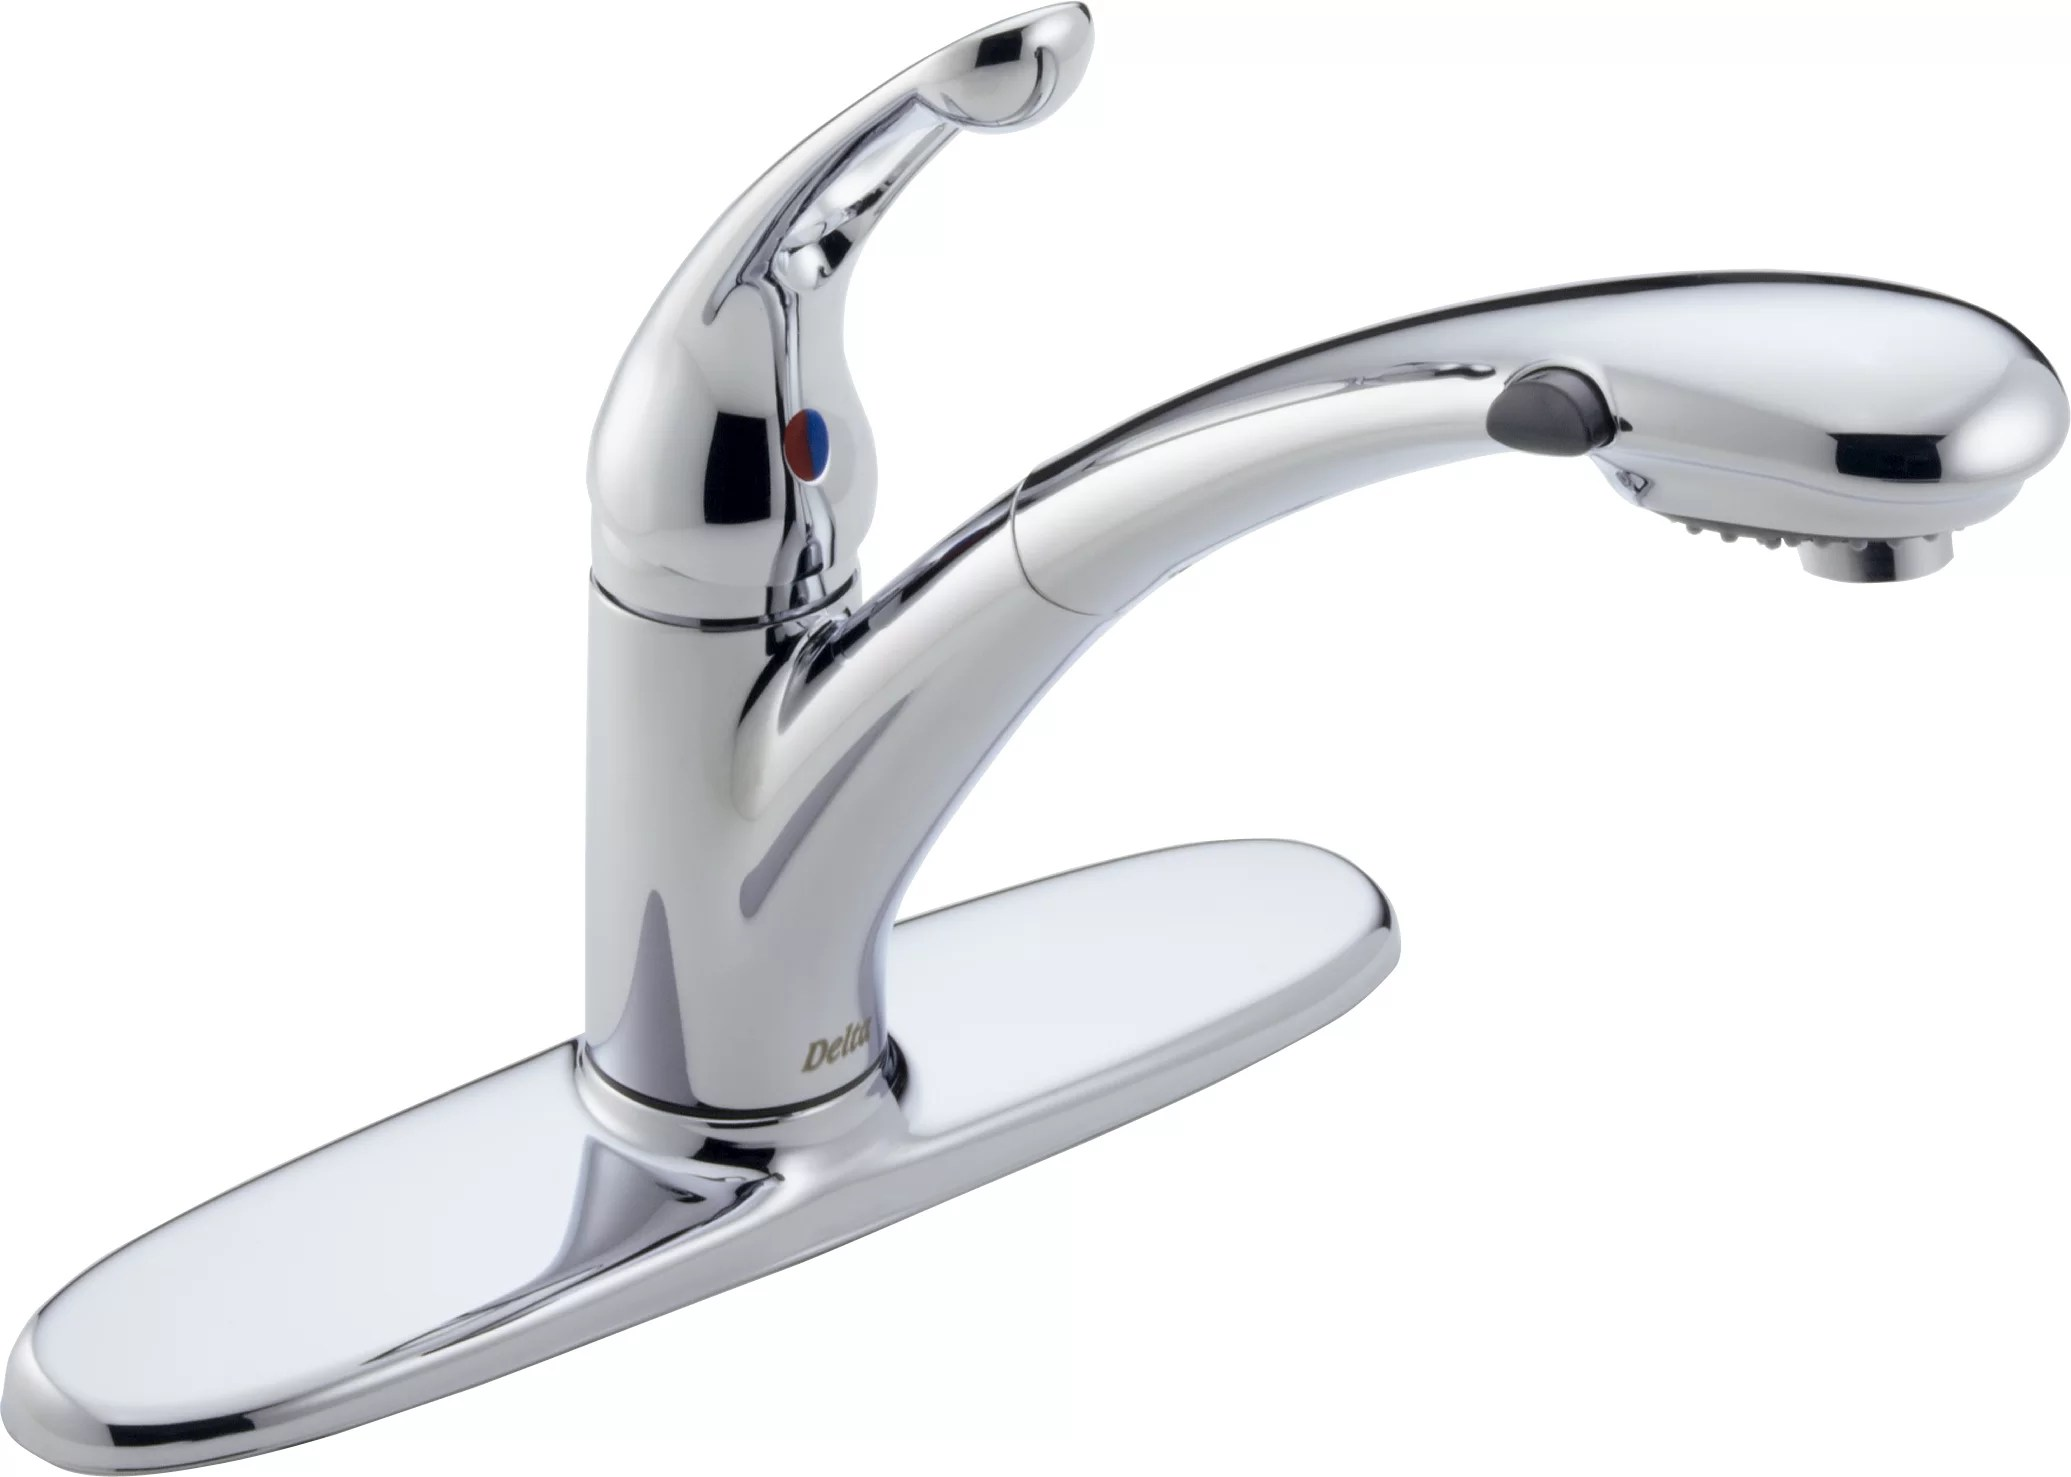 pull out kitchen faucets appliance repair delta 472 dst chrome signature faucet includes lifetime warranty com